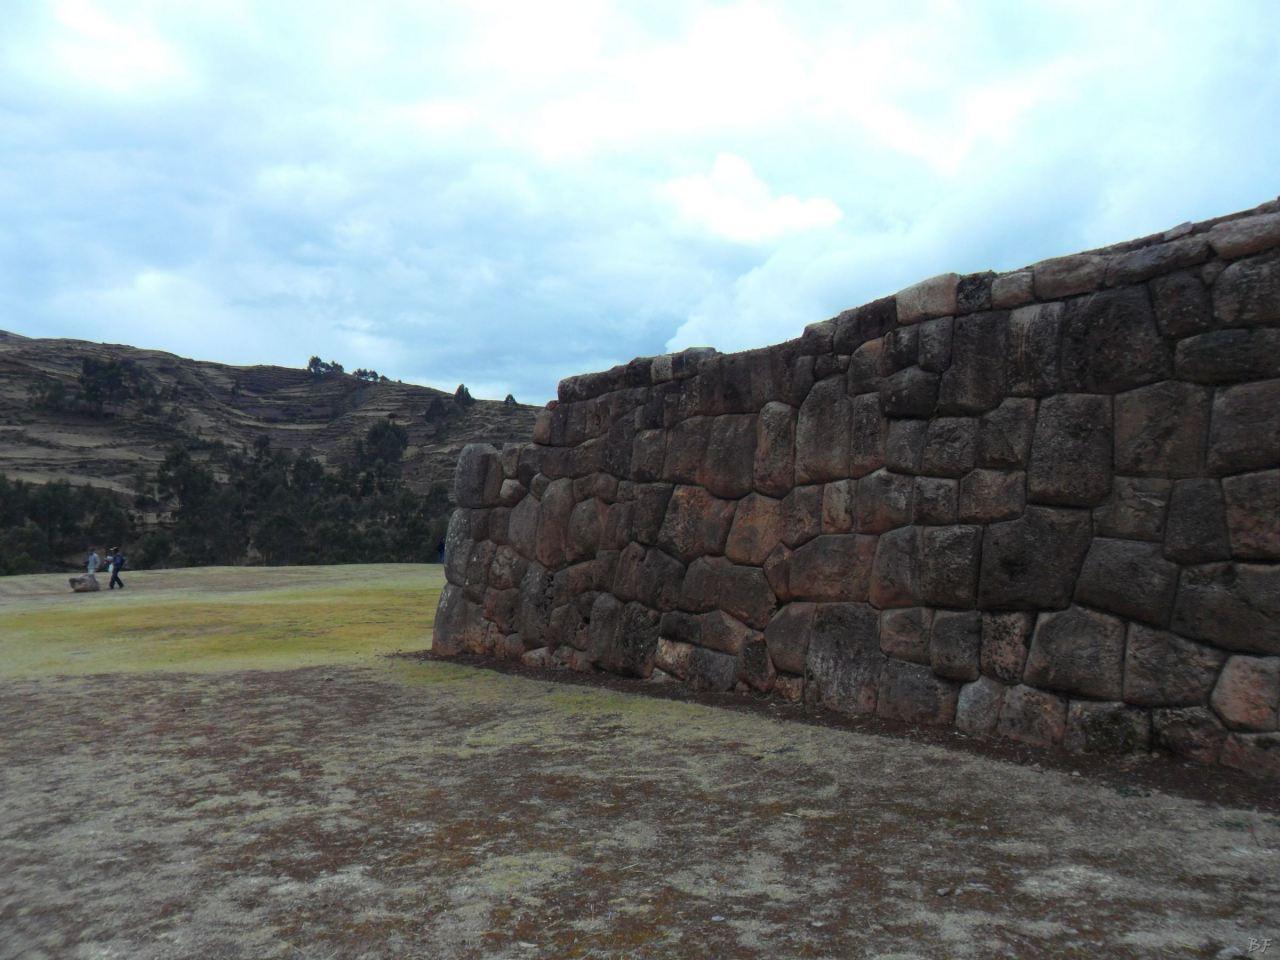 Chinchero-Mura-Poligonali-Piramide-Urubamba-Peru-37